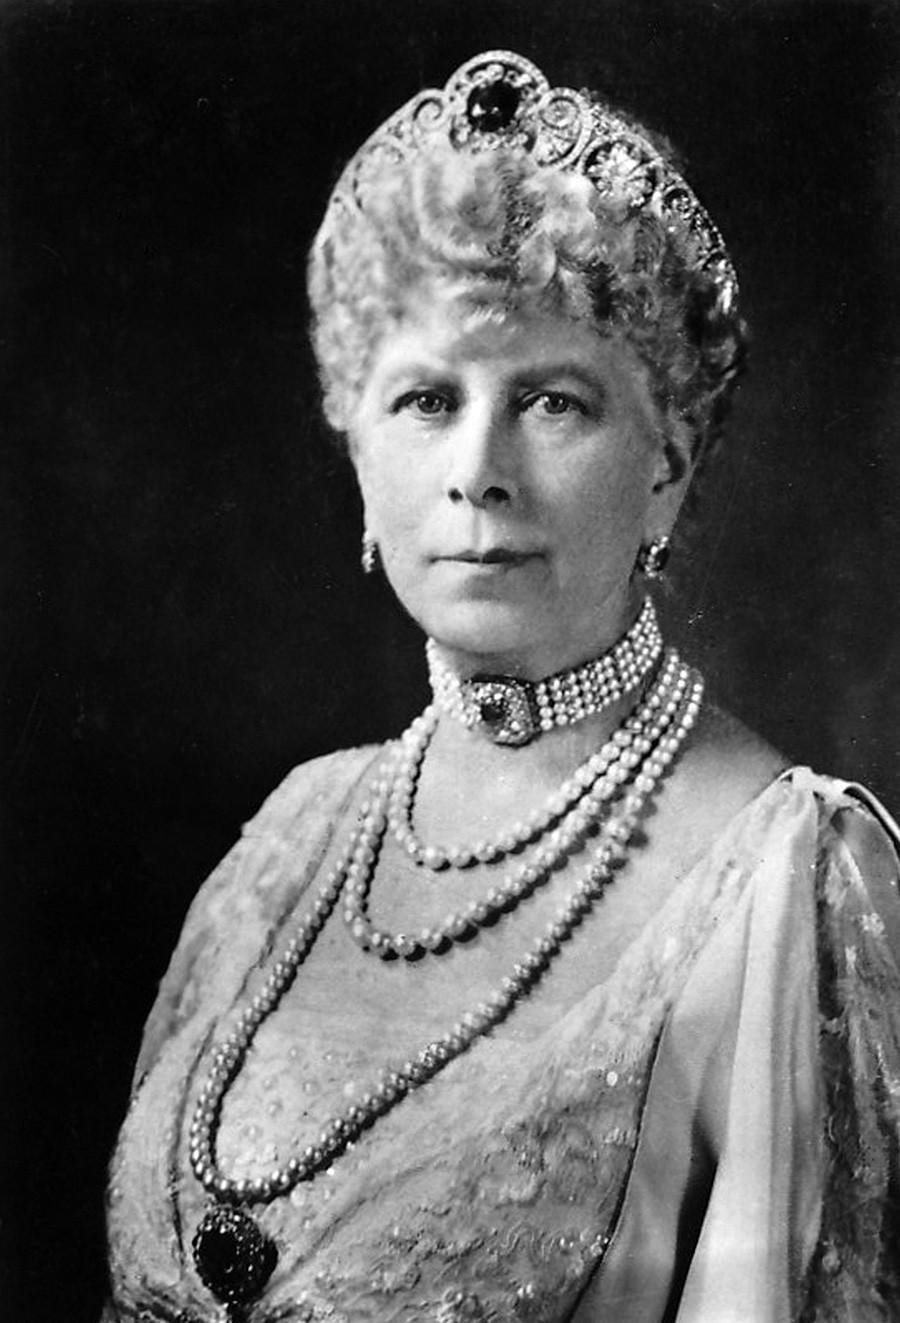 Rainha Maria de Teck (1867-1953).